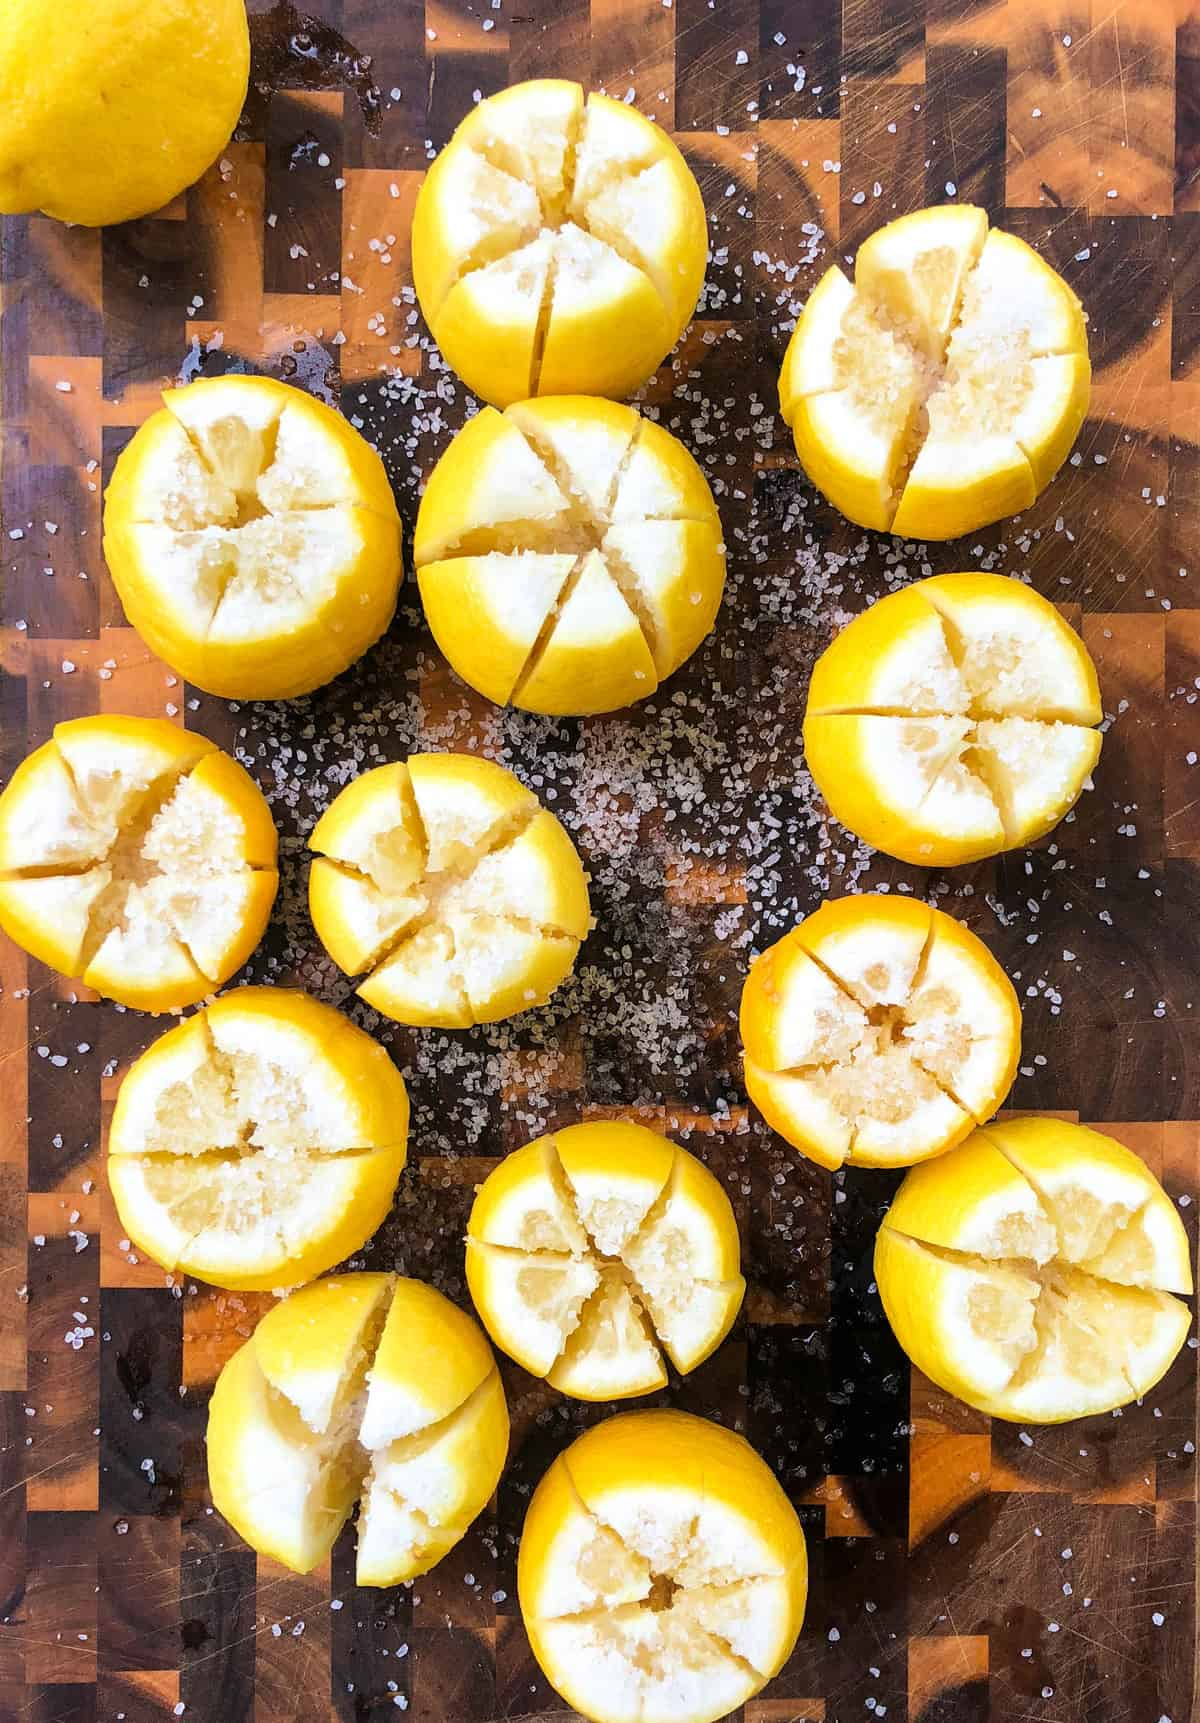 Add coarse salt to the lemons.